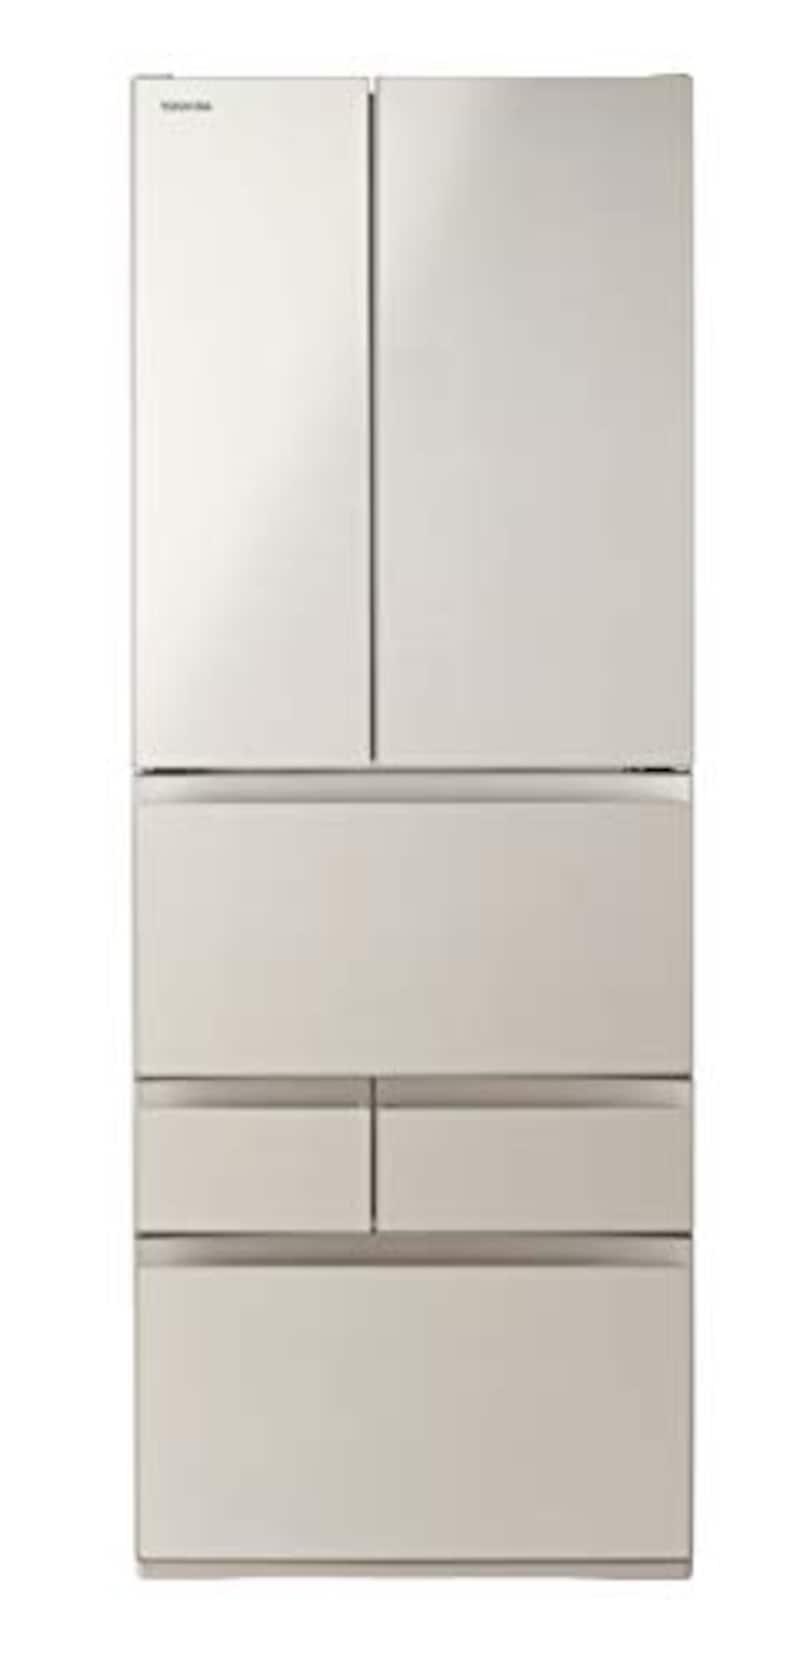 TOSHIBA(東芝),6ドア冷蔵庫 VEGETA(ベジータ),GR-S550FH-EC